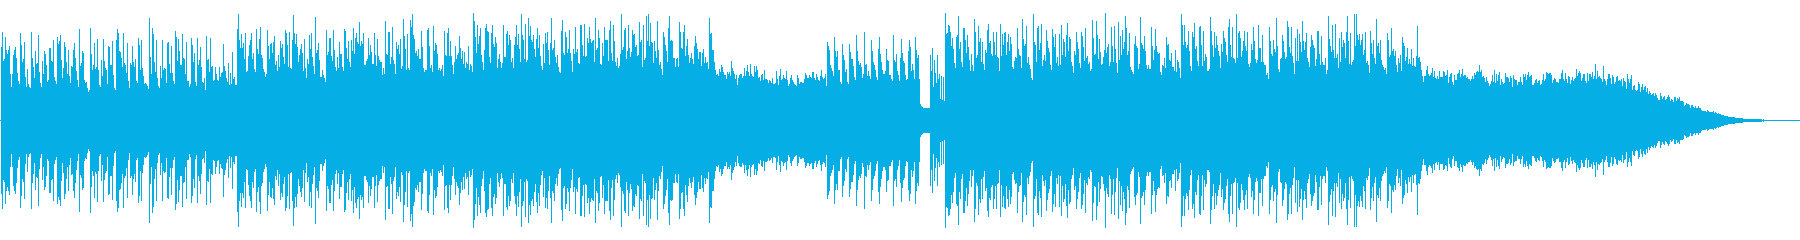 texture4の再生済みの波形